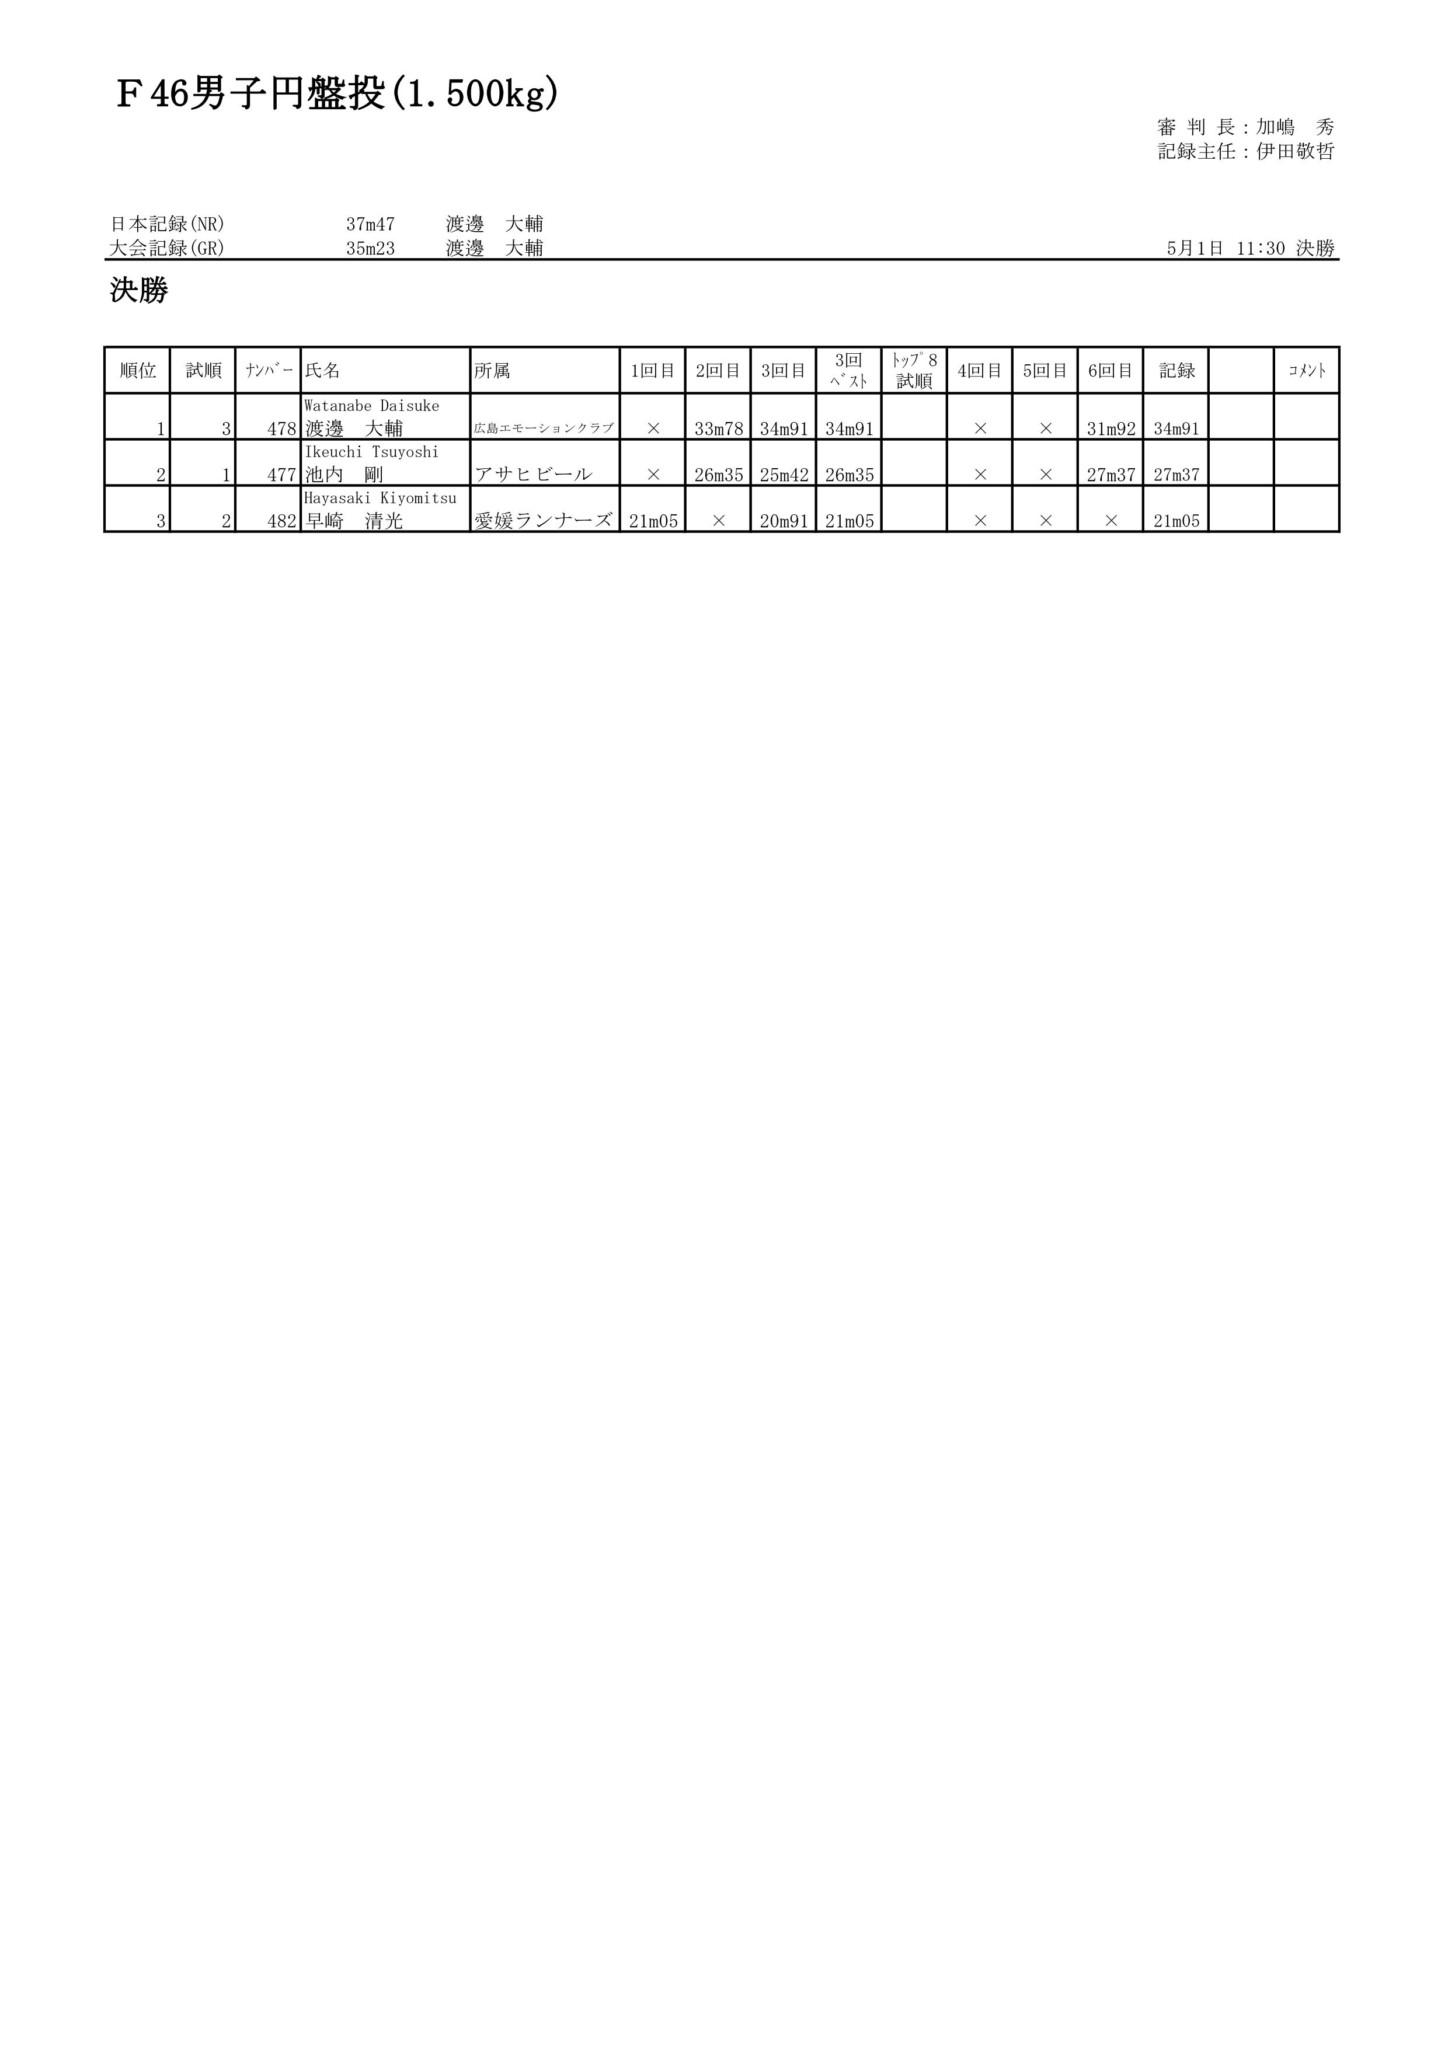 42F46男子円盤投(1.500kg)_01